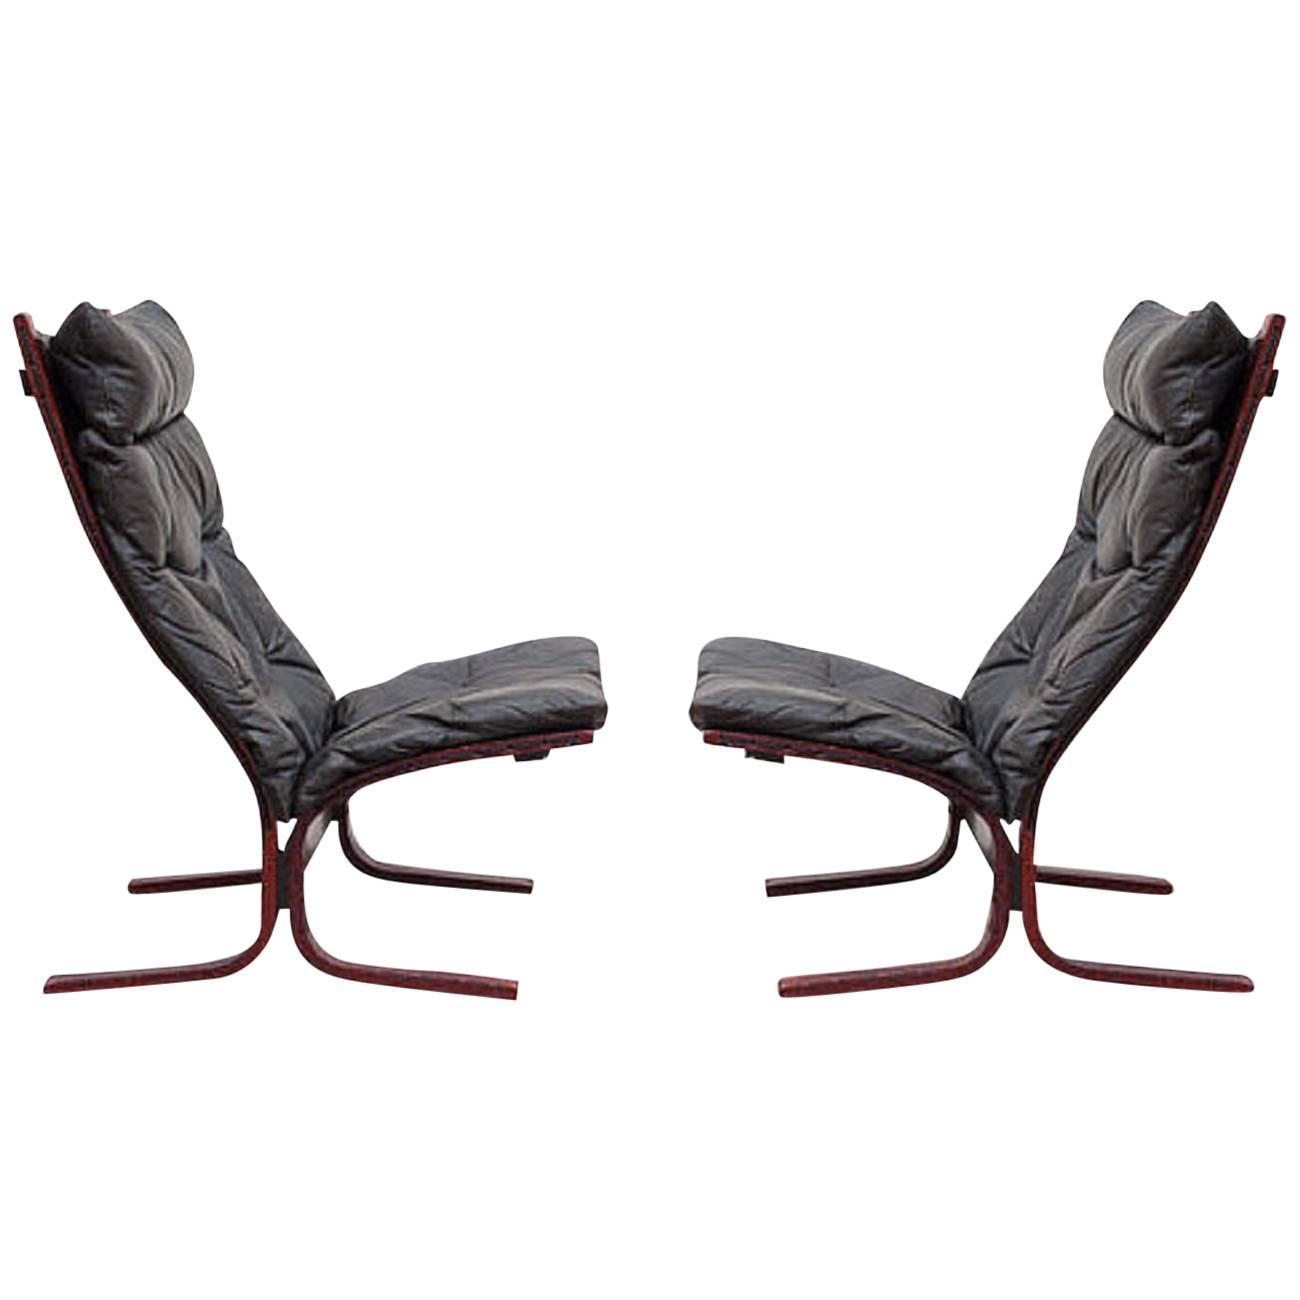 Pair Of Siesta Sling Chairs By Ingmar Relling For Westnofa At 1stdibs